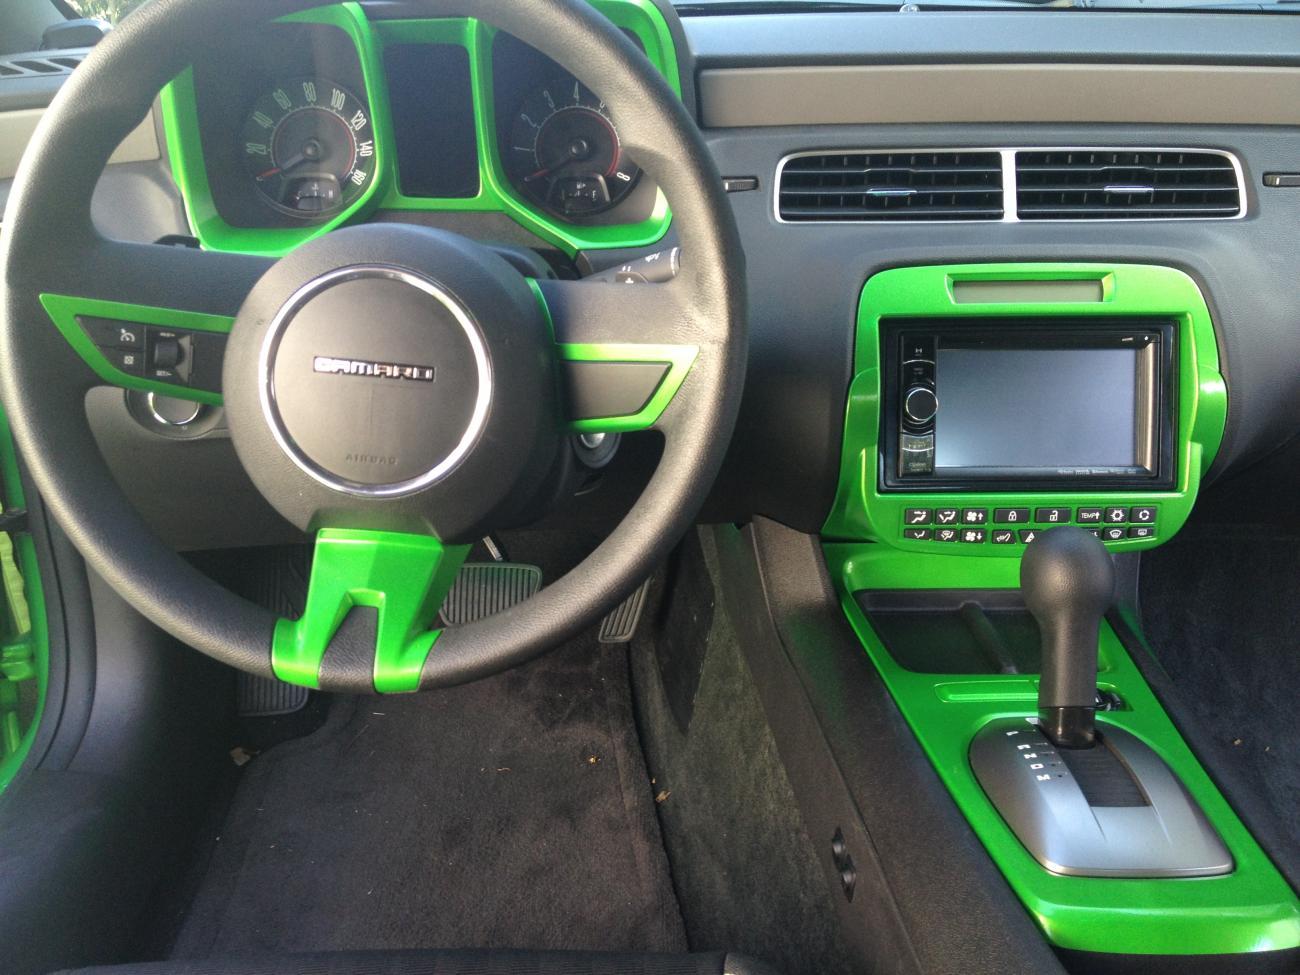 Painted Some Interior Parts Green Pics Camaro5 Chevy Camaro Forum Camaro Zl1 Ss And V6